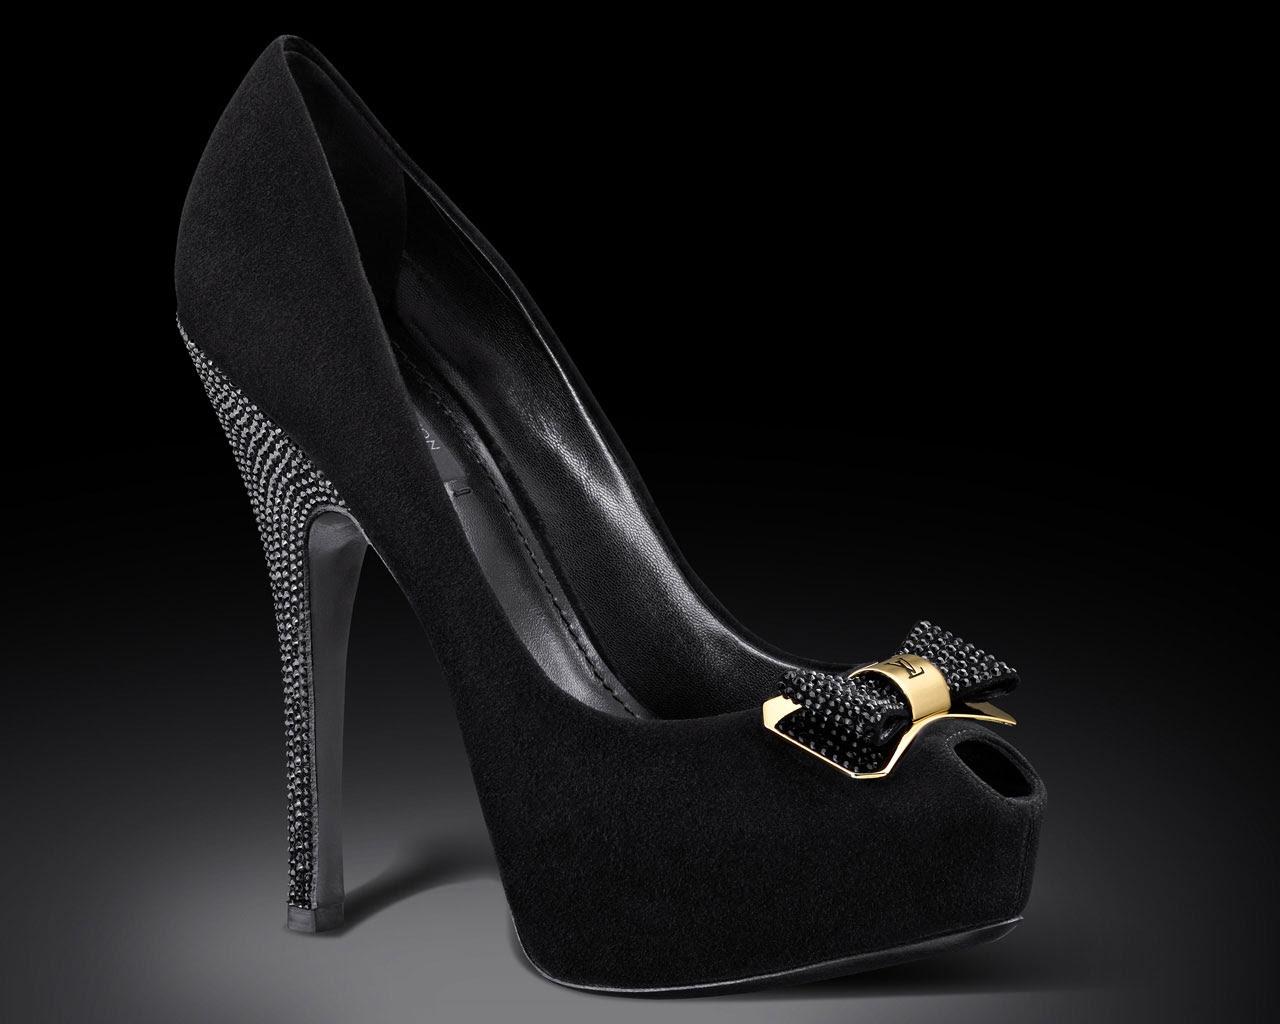 68624af7d9ba Artist Today  Latest Pink Shoes Designs for Women